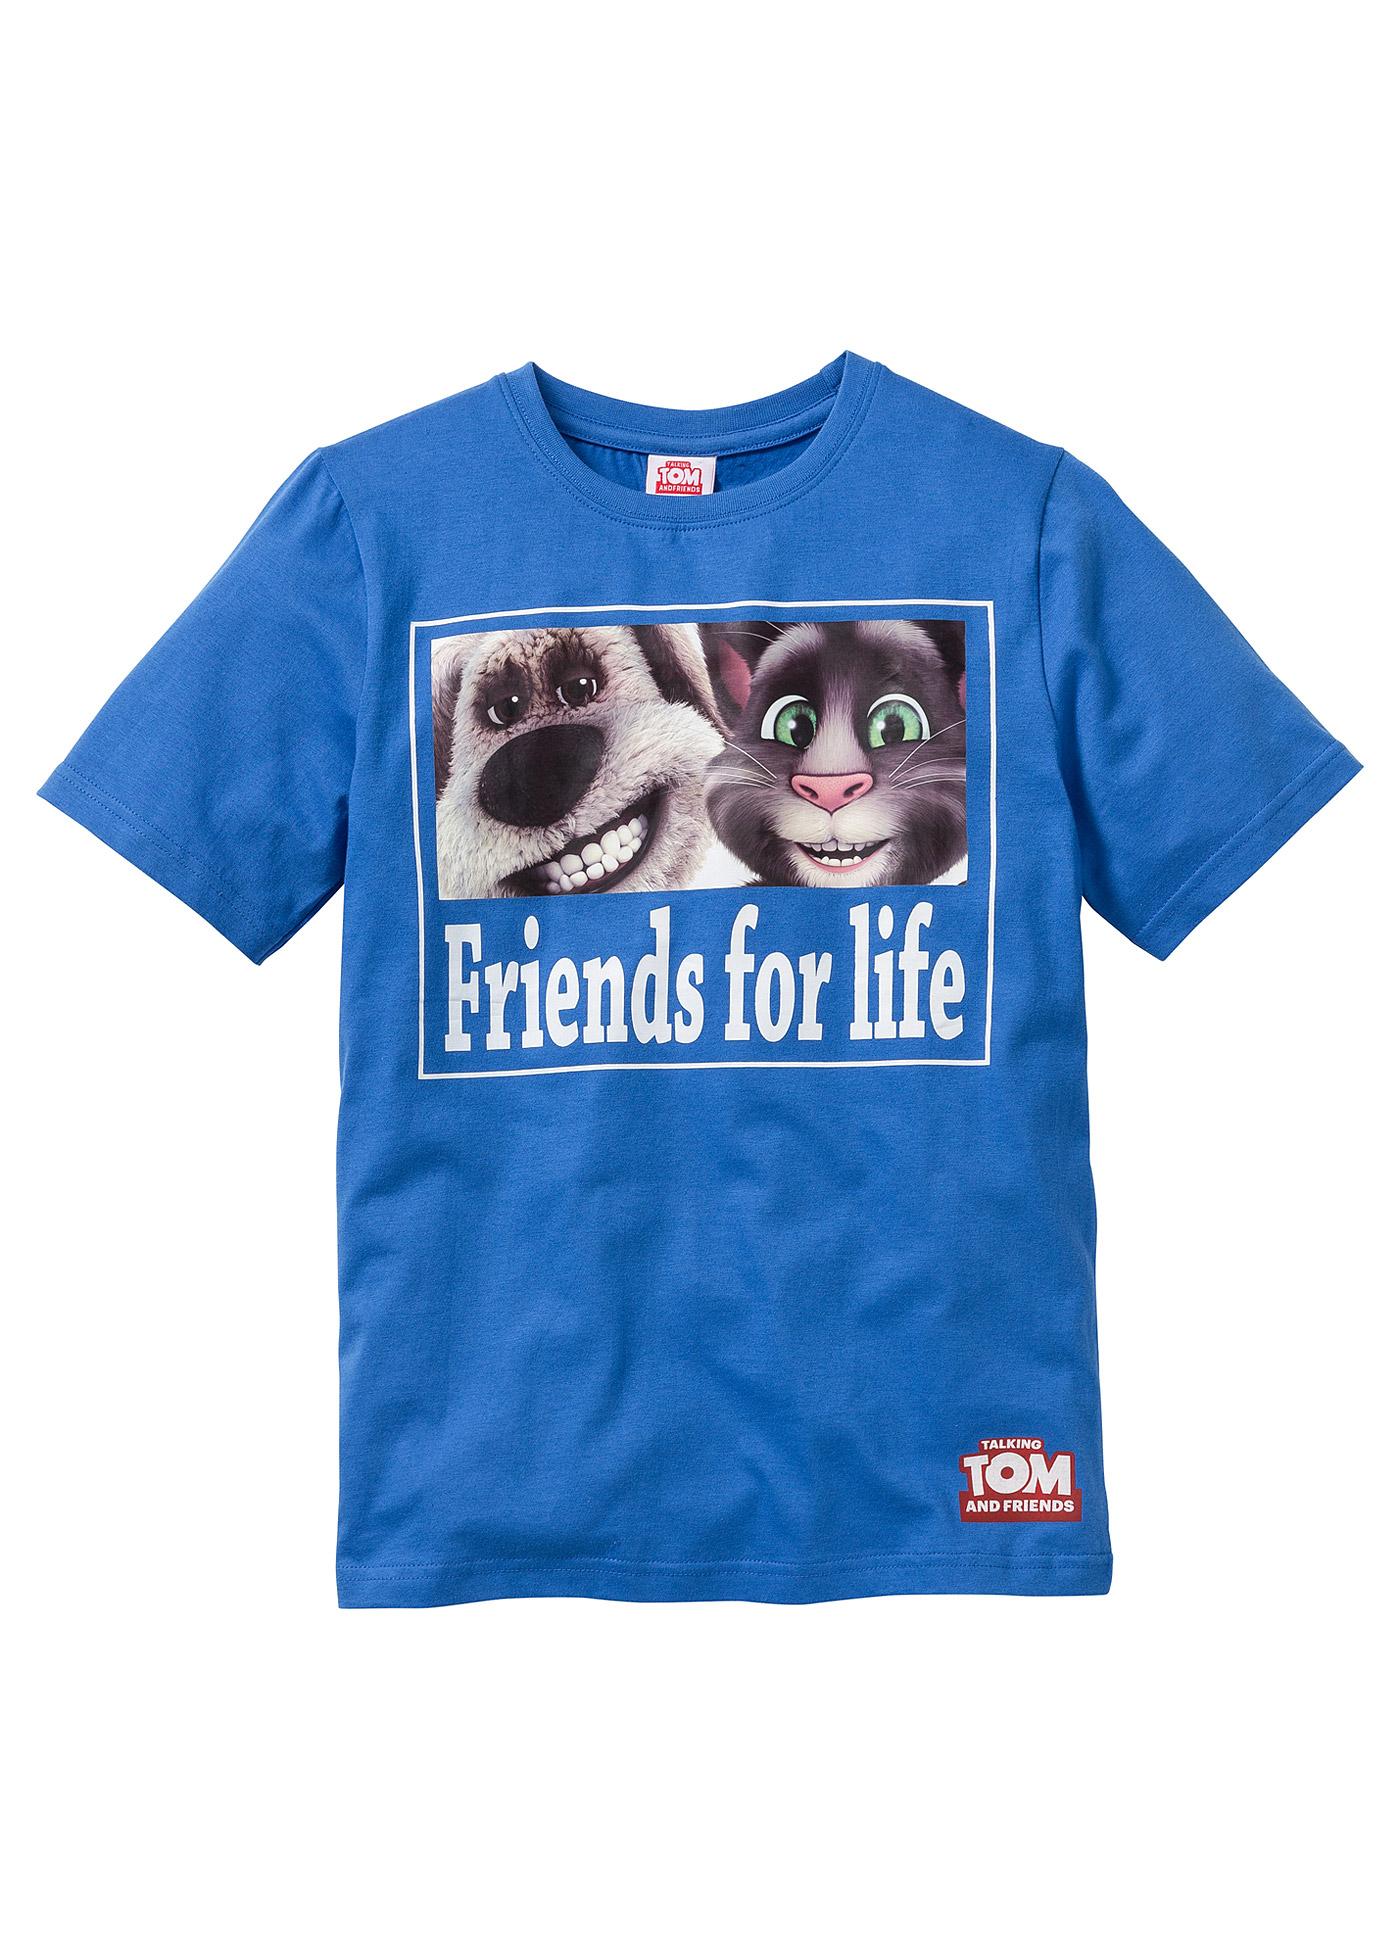 T-shirt talking tom and friends, t....